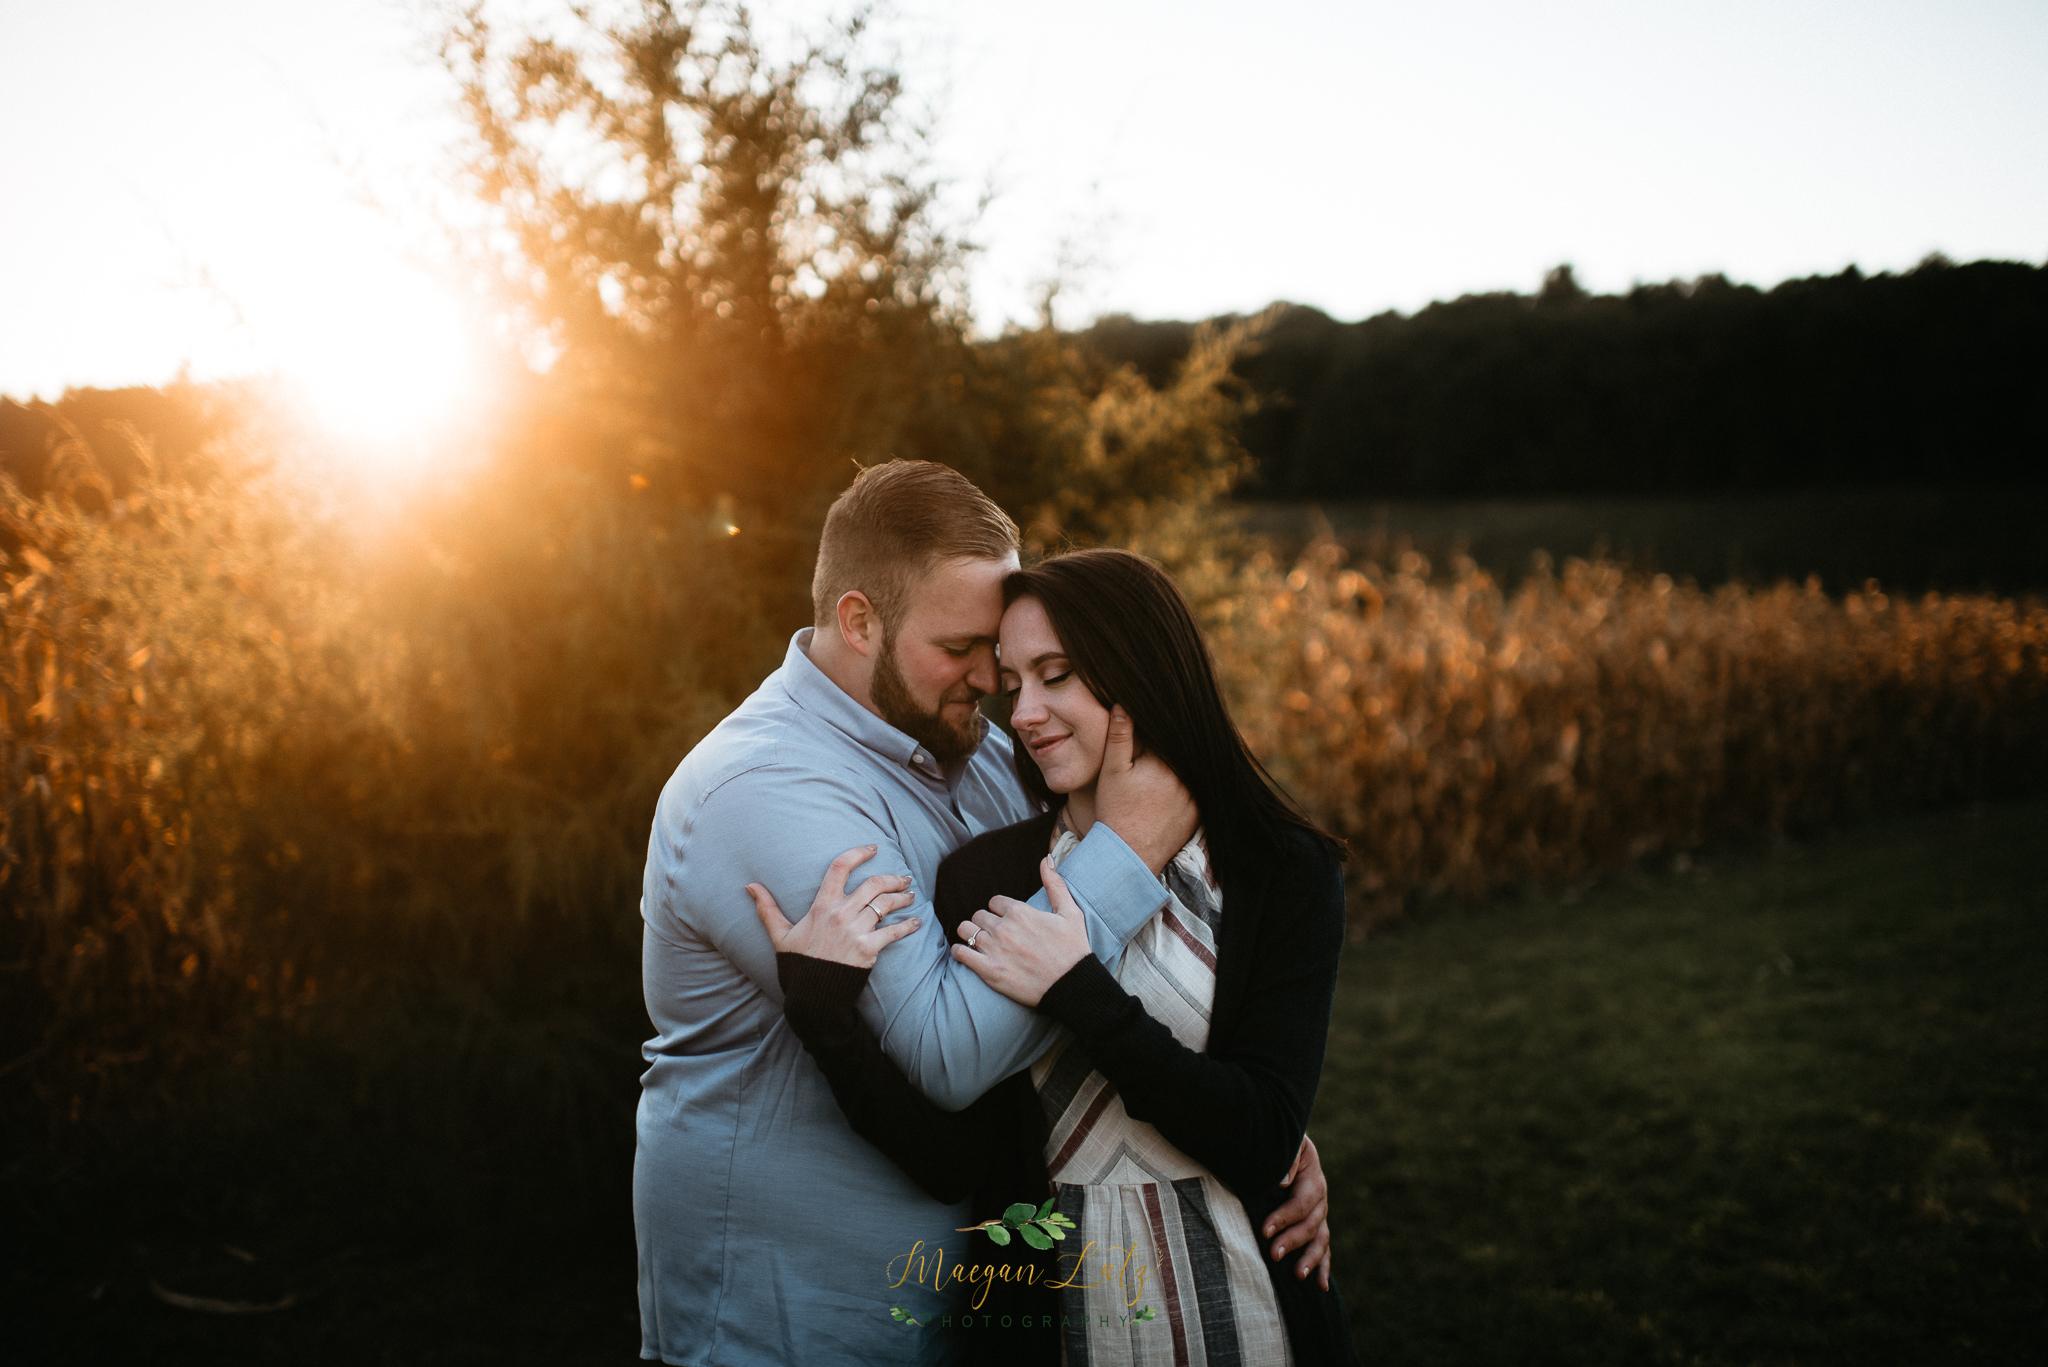 Engagement session at Blue Ridge Estate Vineyard & Winery